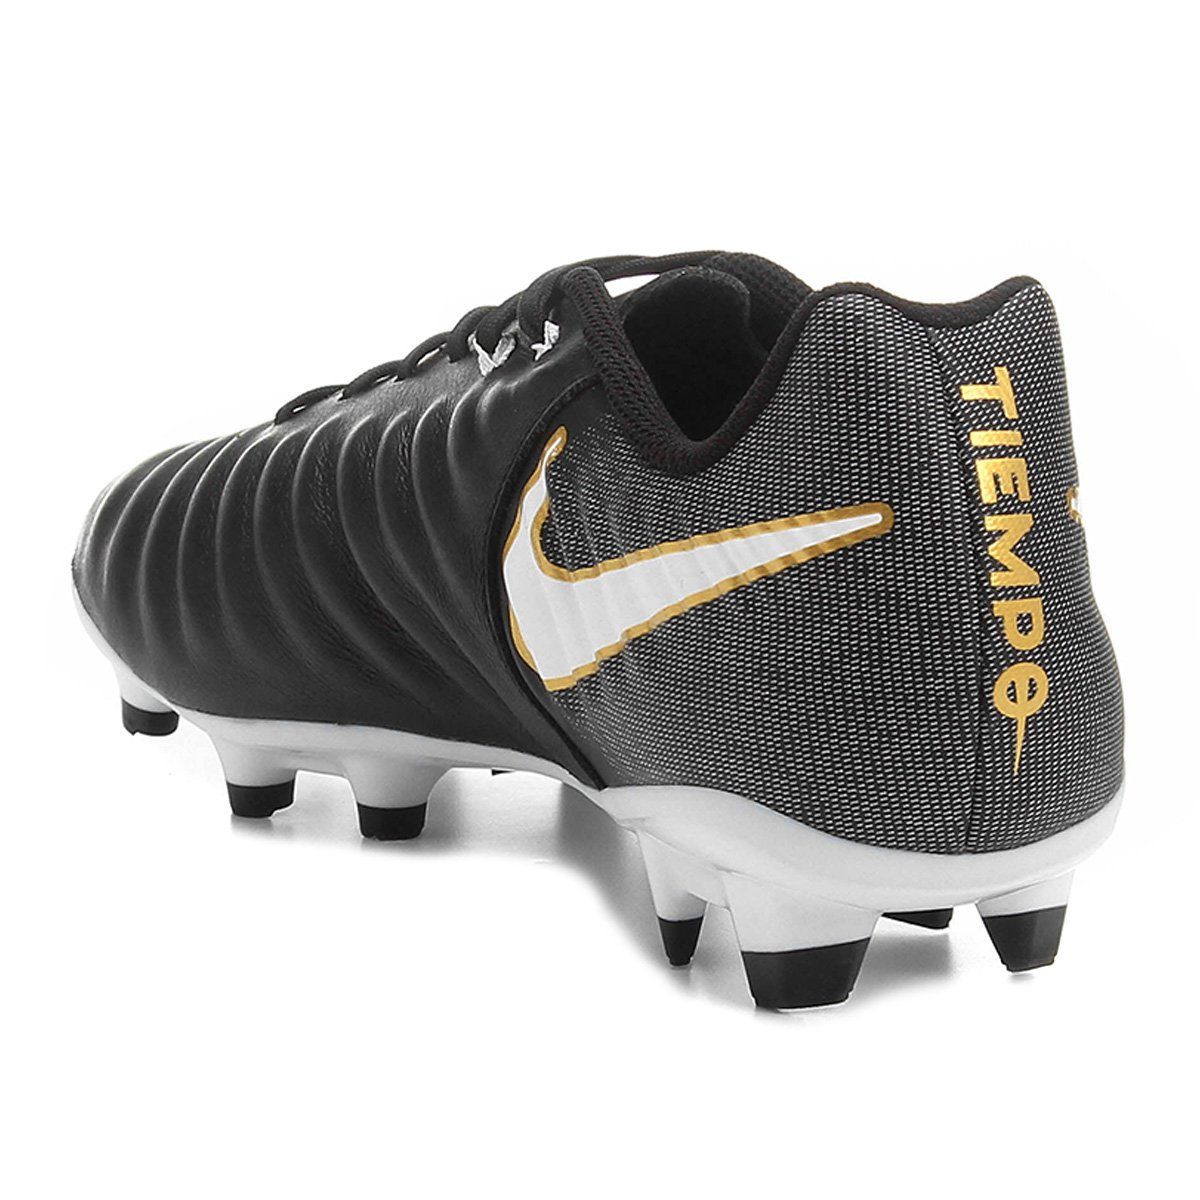 a4a84a3825 Chuteira Campo Nike Tiempo Ligera 4 FG - Preto e Branco - Compre ...